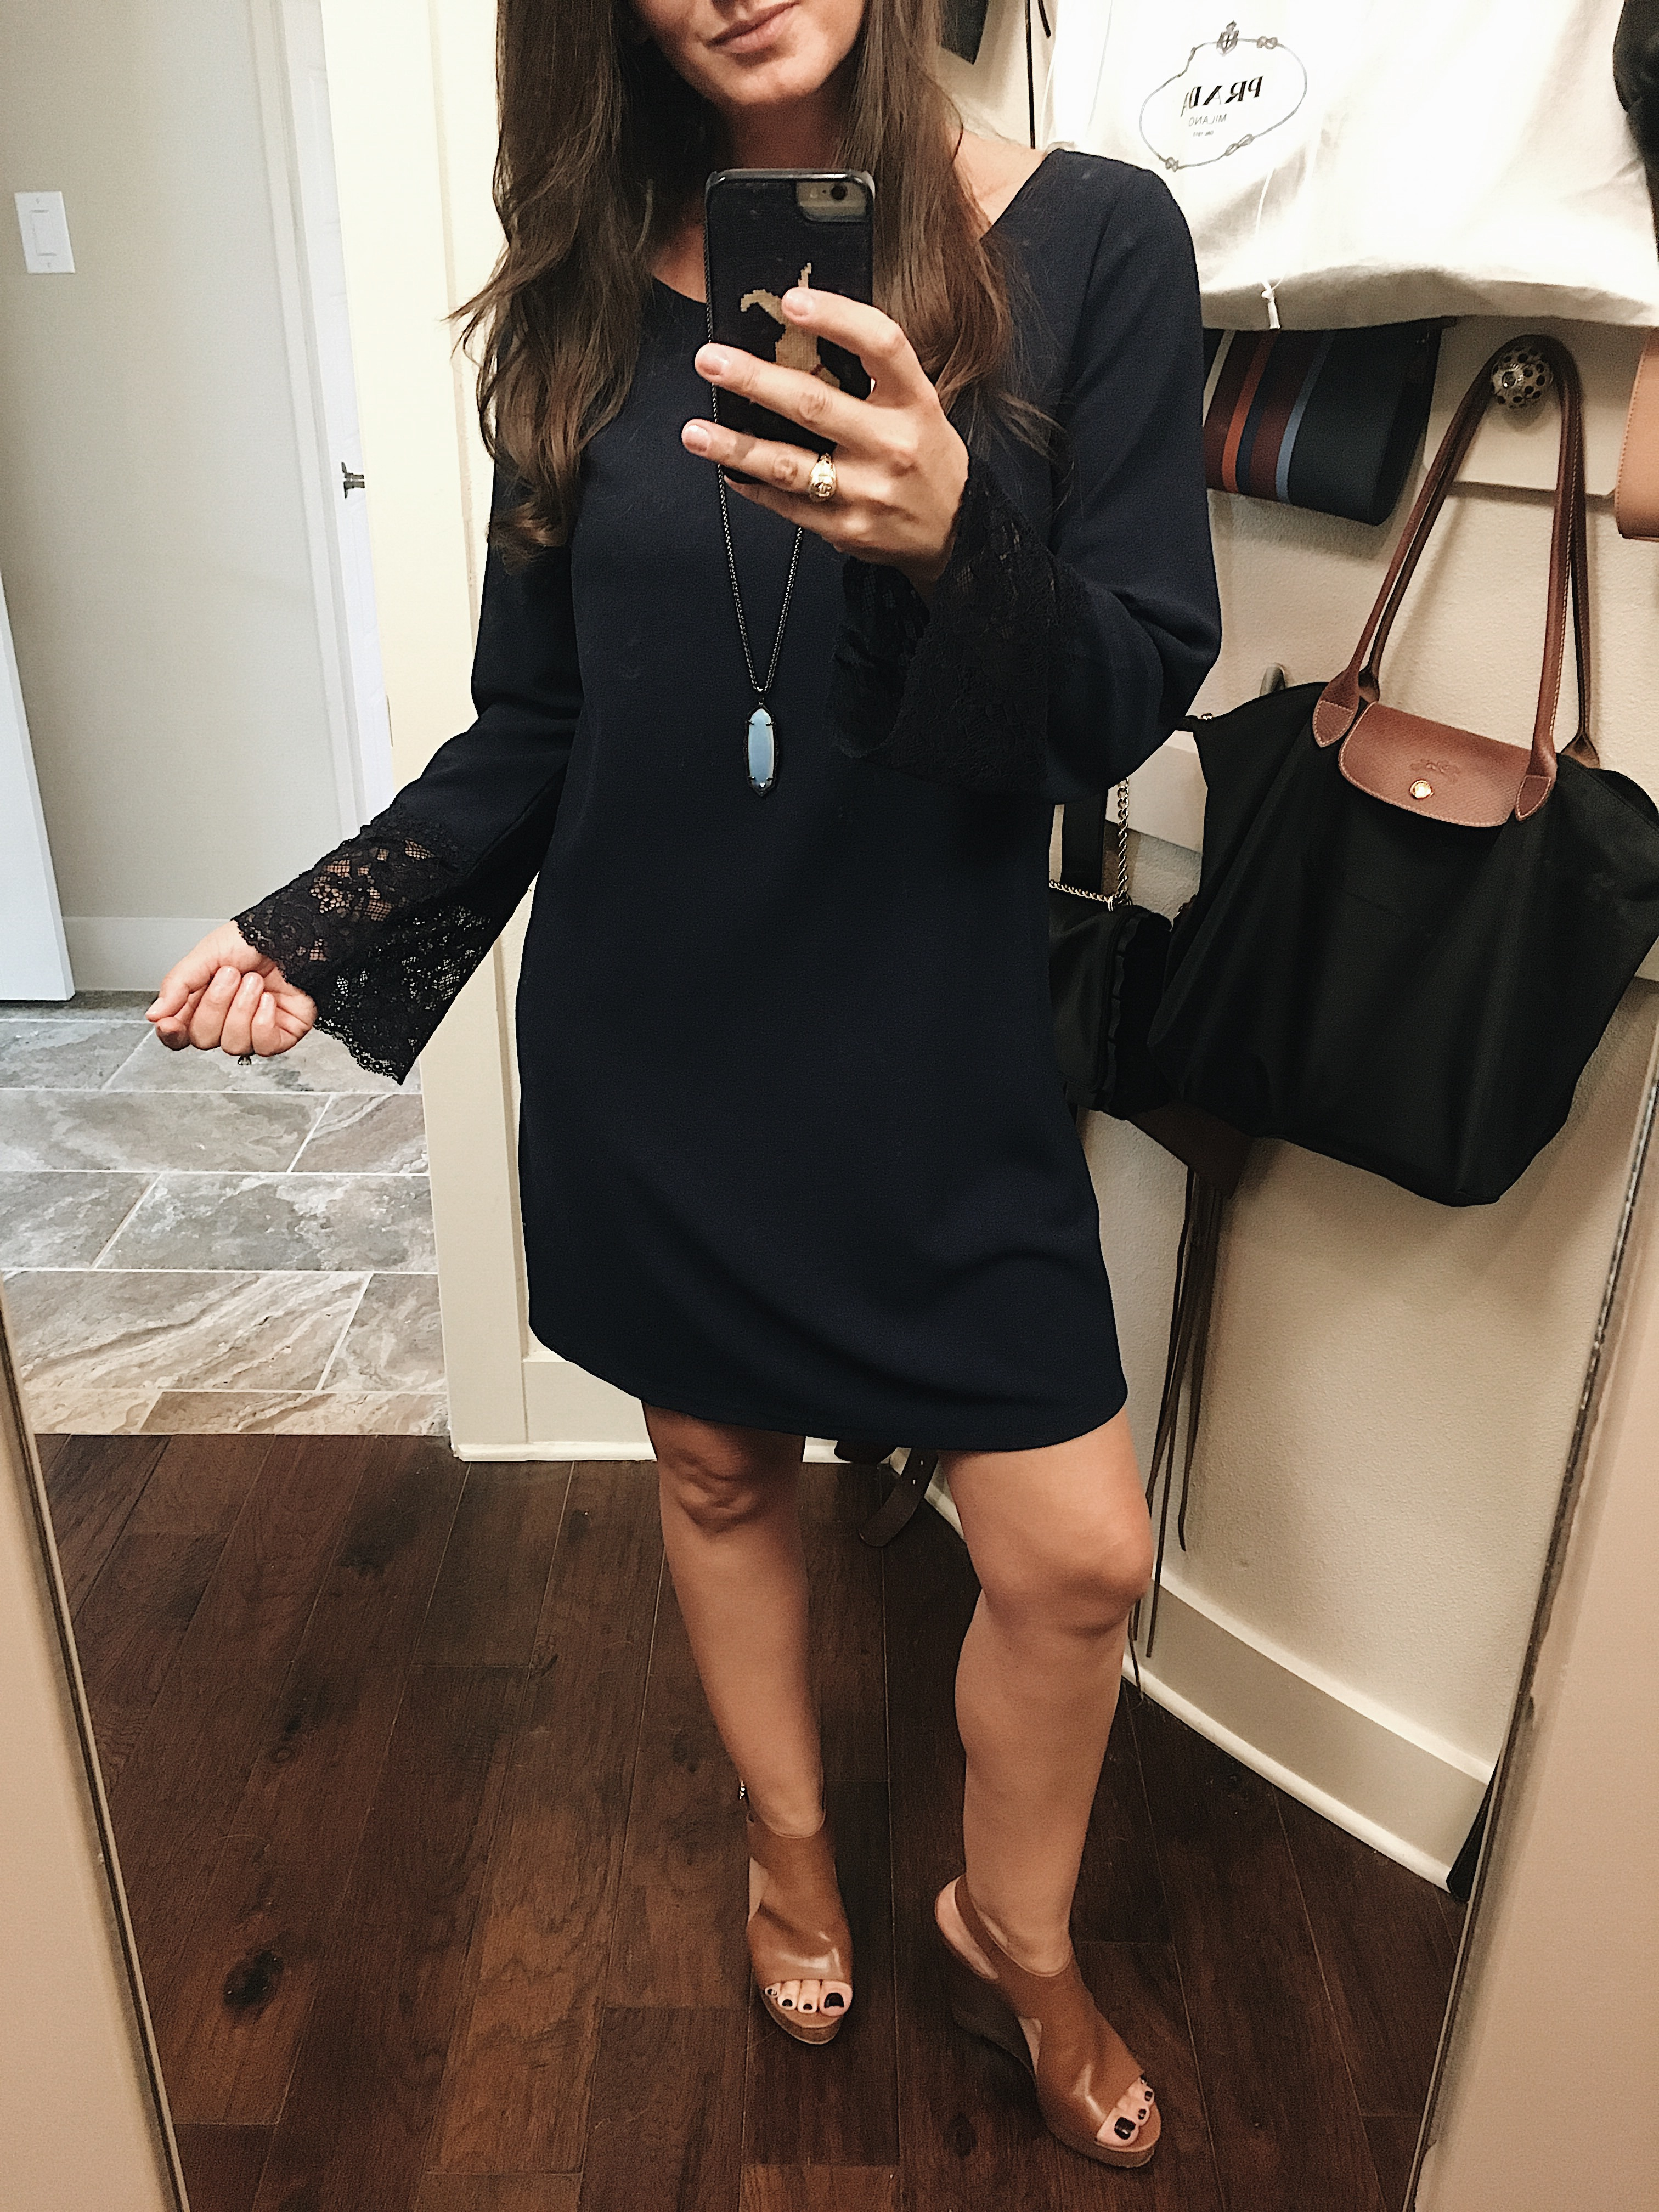 OOTD, #ootd, Dress, Shift dress, bell sleeves, wedges